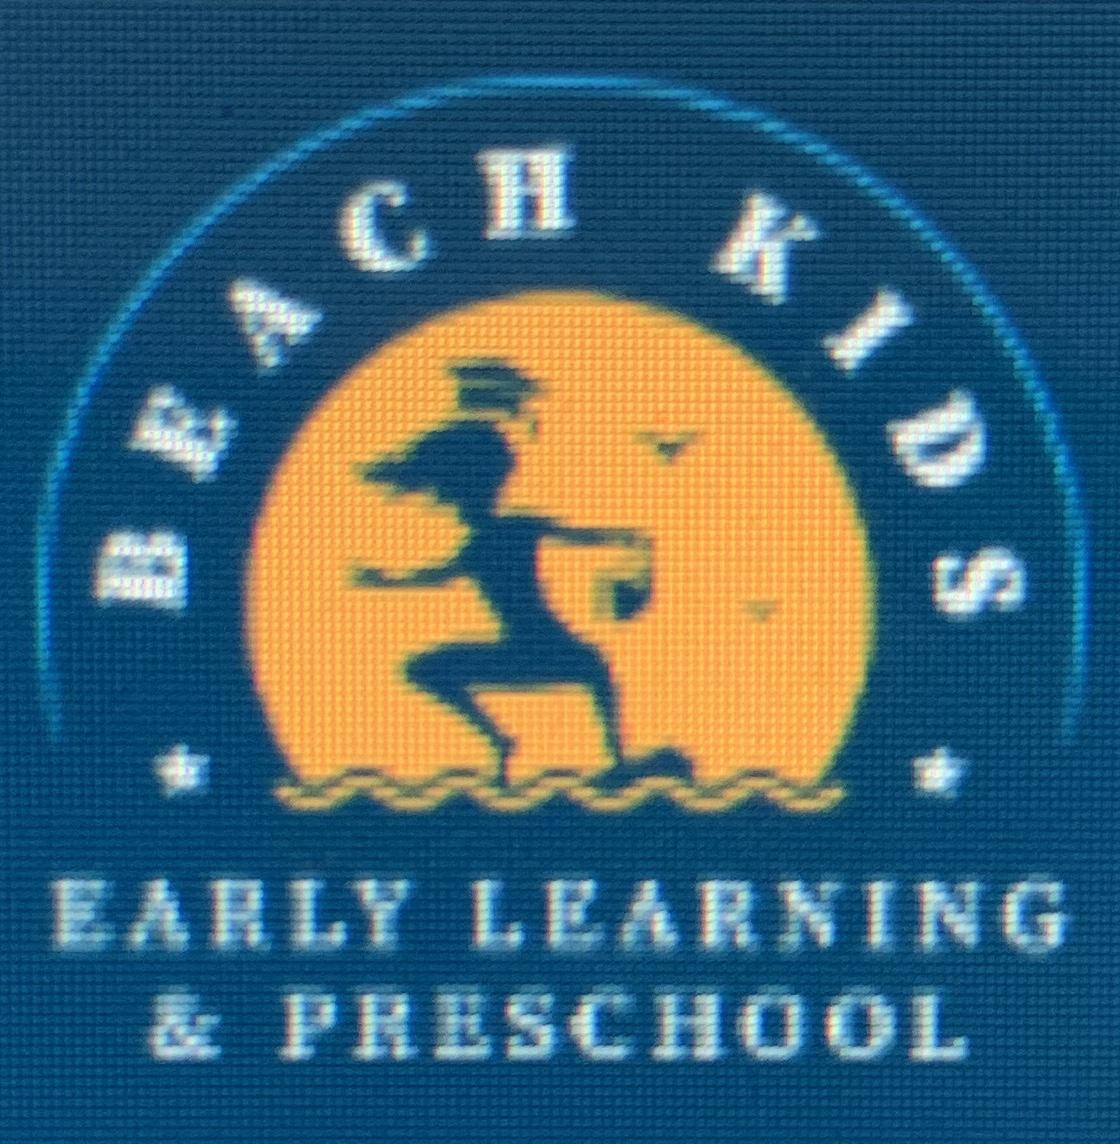 Beach kids early learning